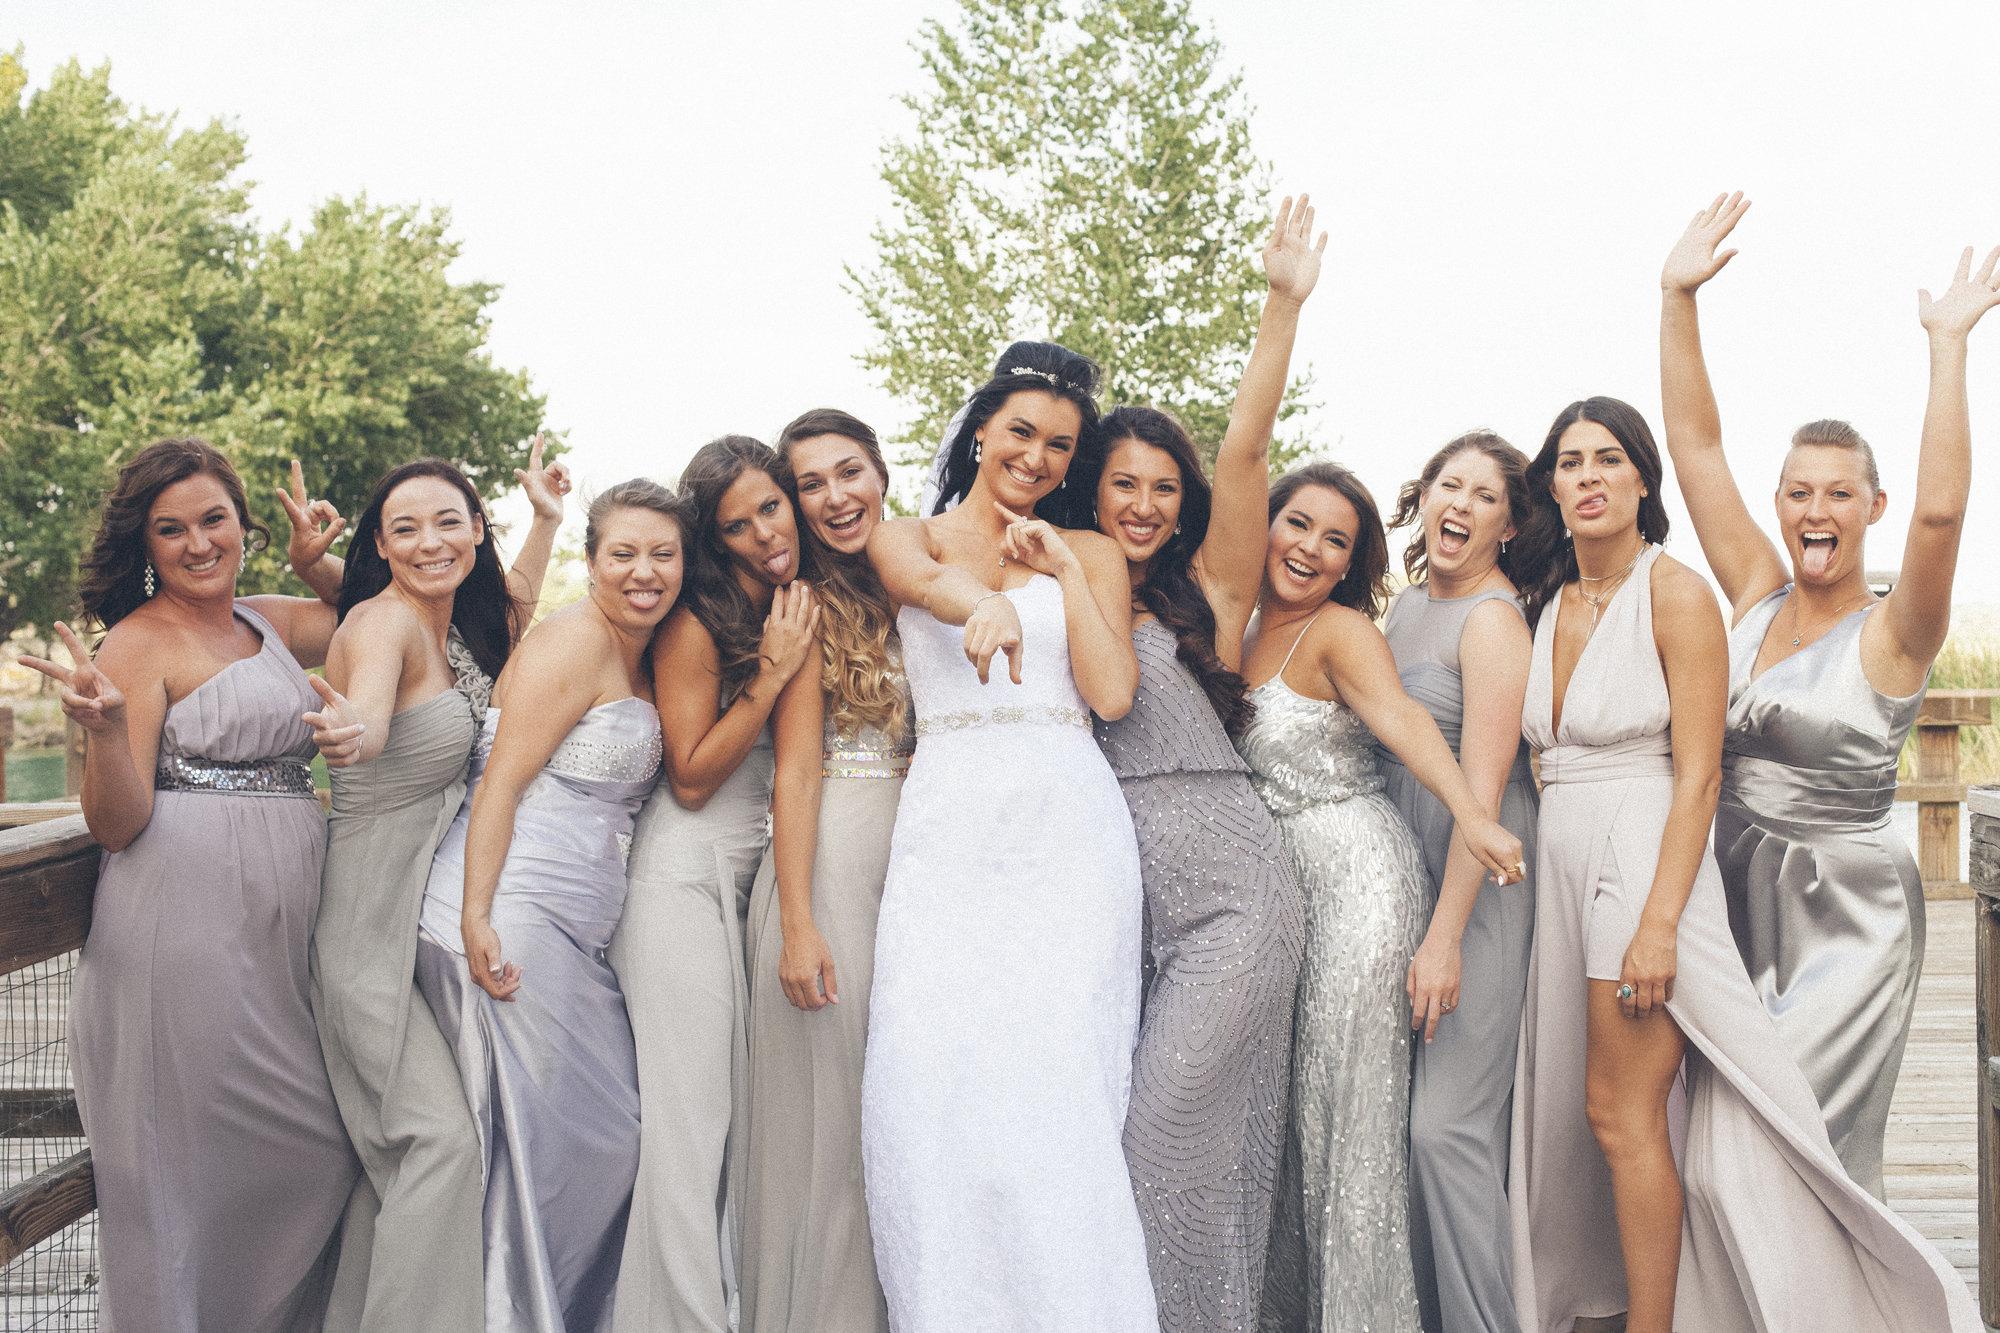 DeMagistris Nunes Wedding-The whole day-0085.jpg